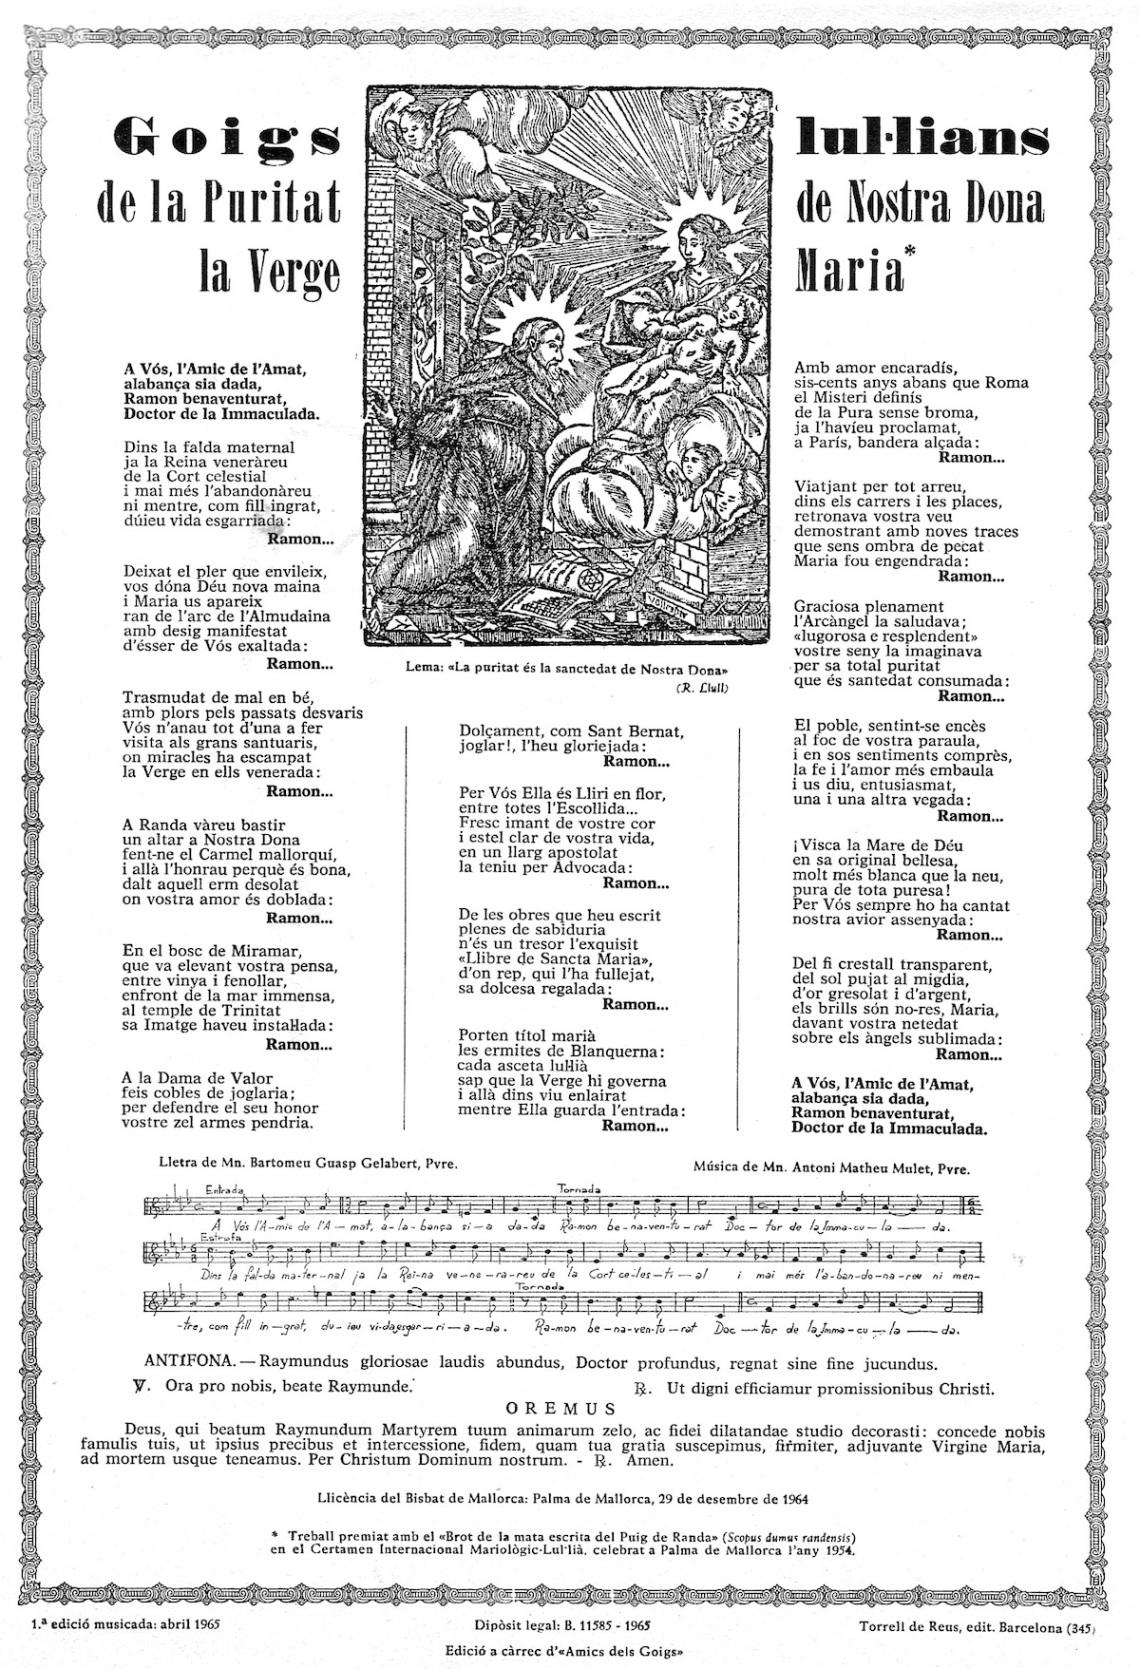 puritat-2ii-goigs-lullians-1965